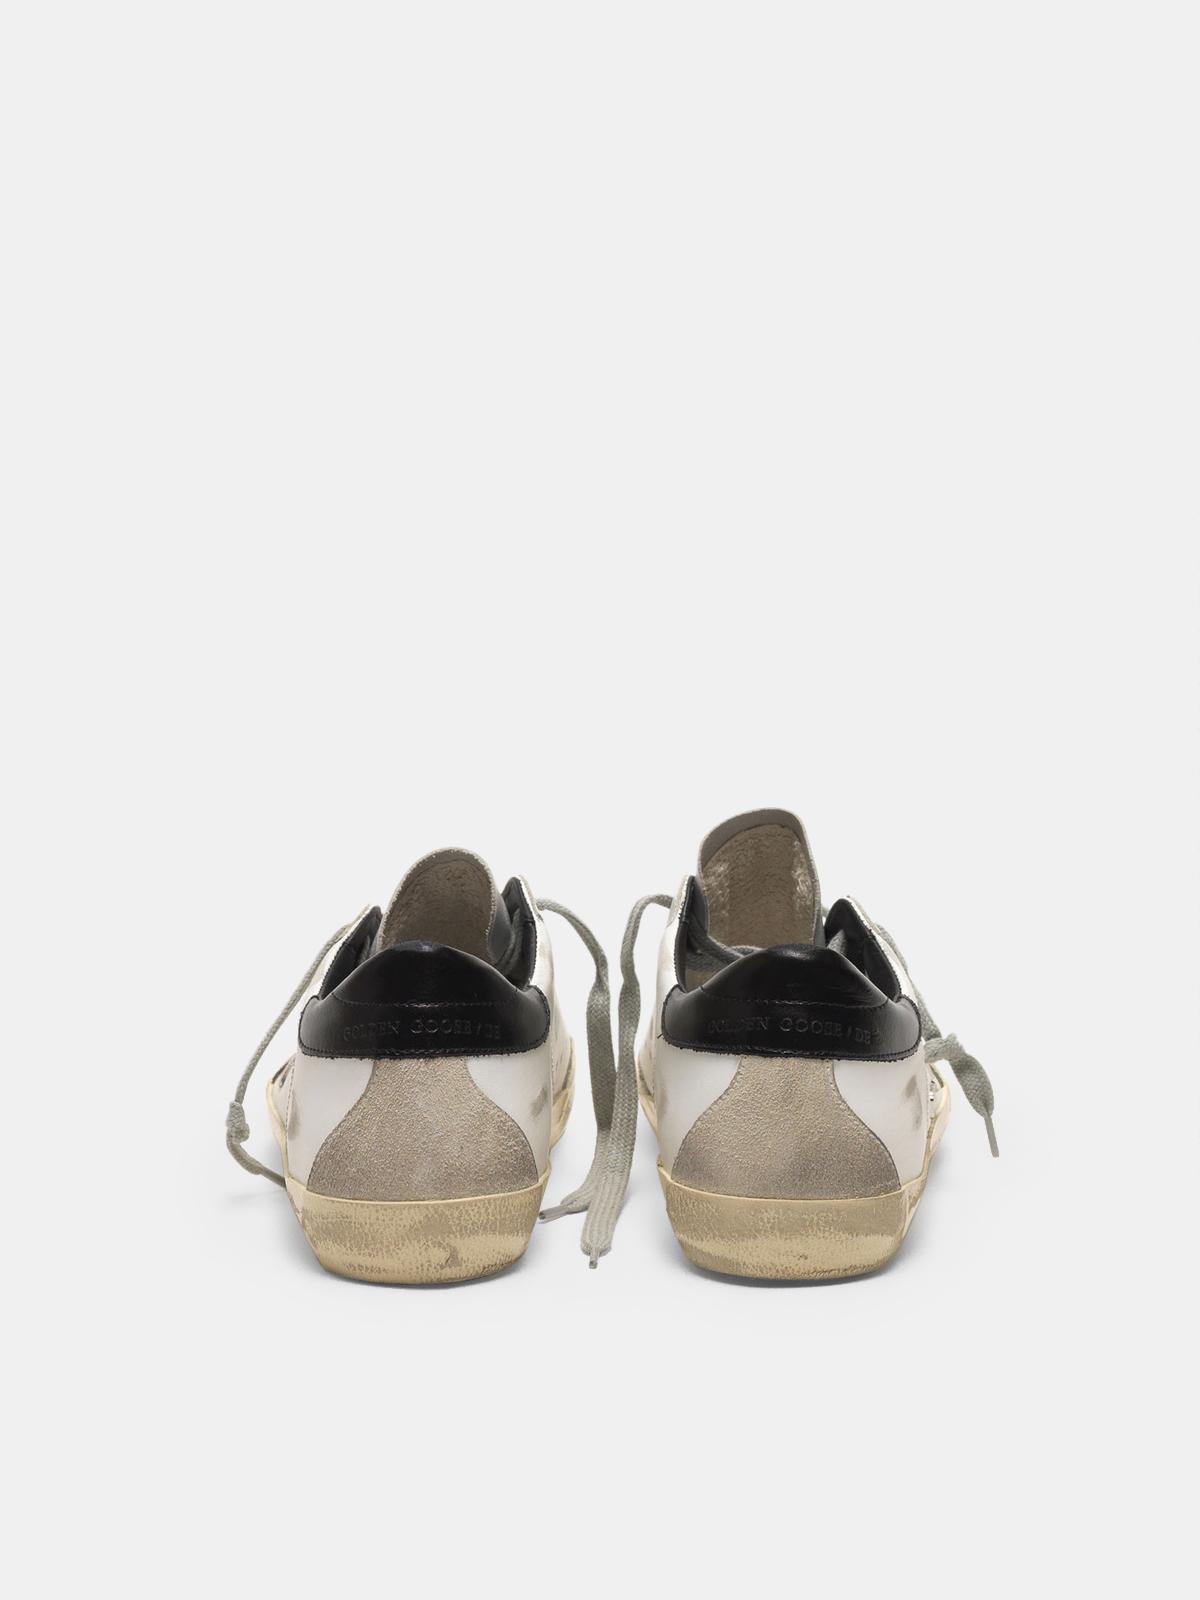 Golden Goose - Super-Star sneakers with black heel tab and metal stud lettering in